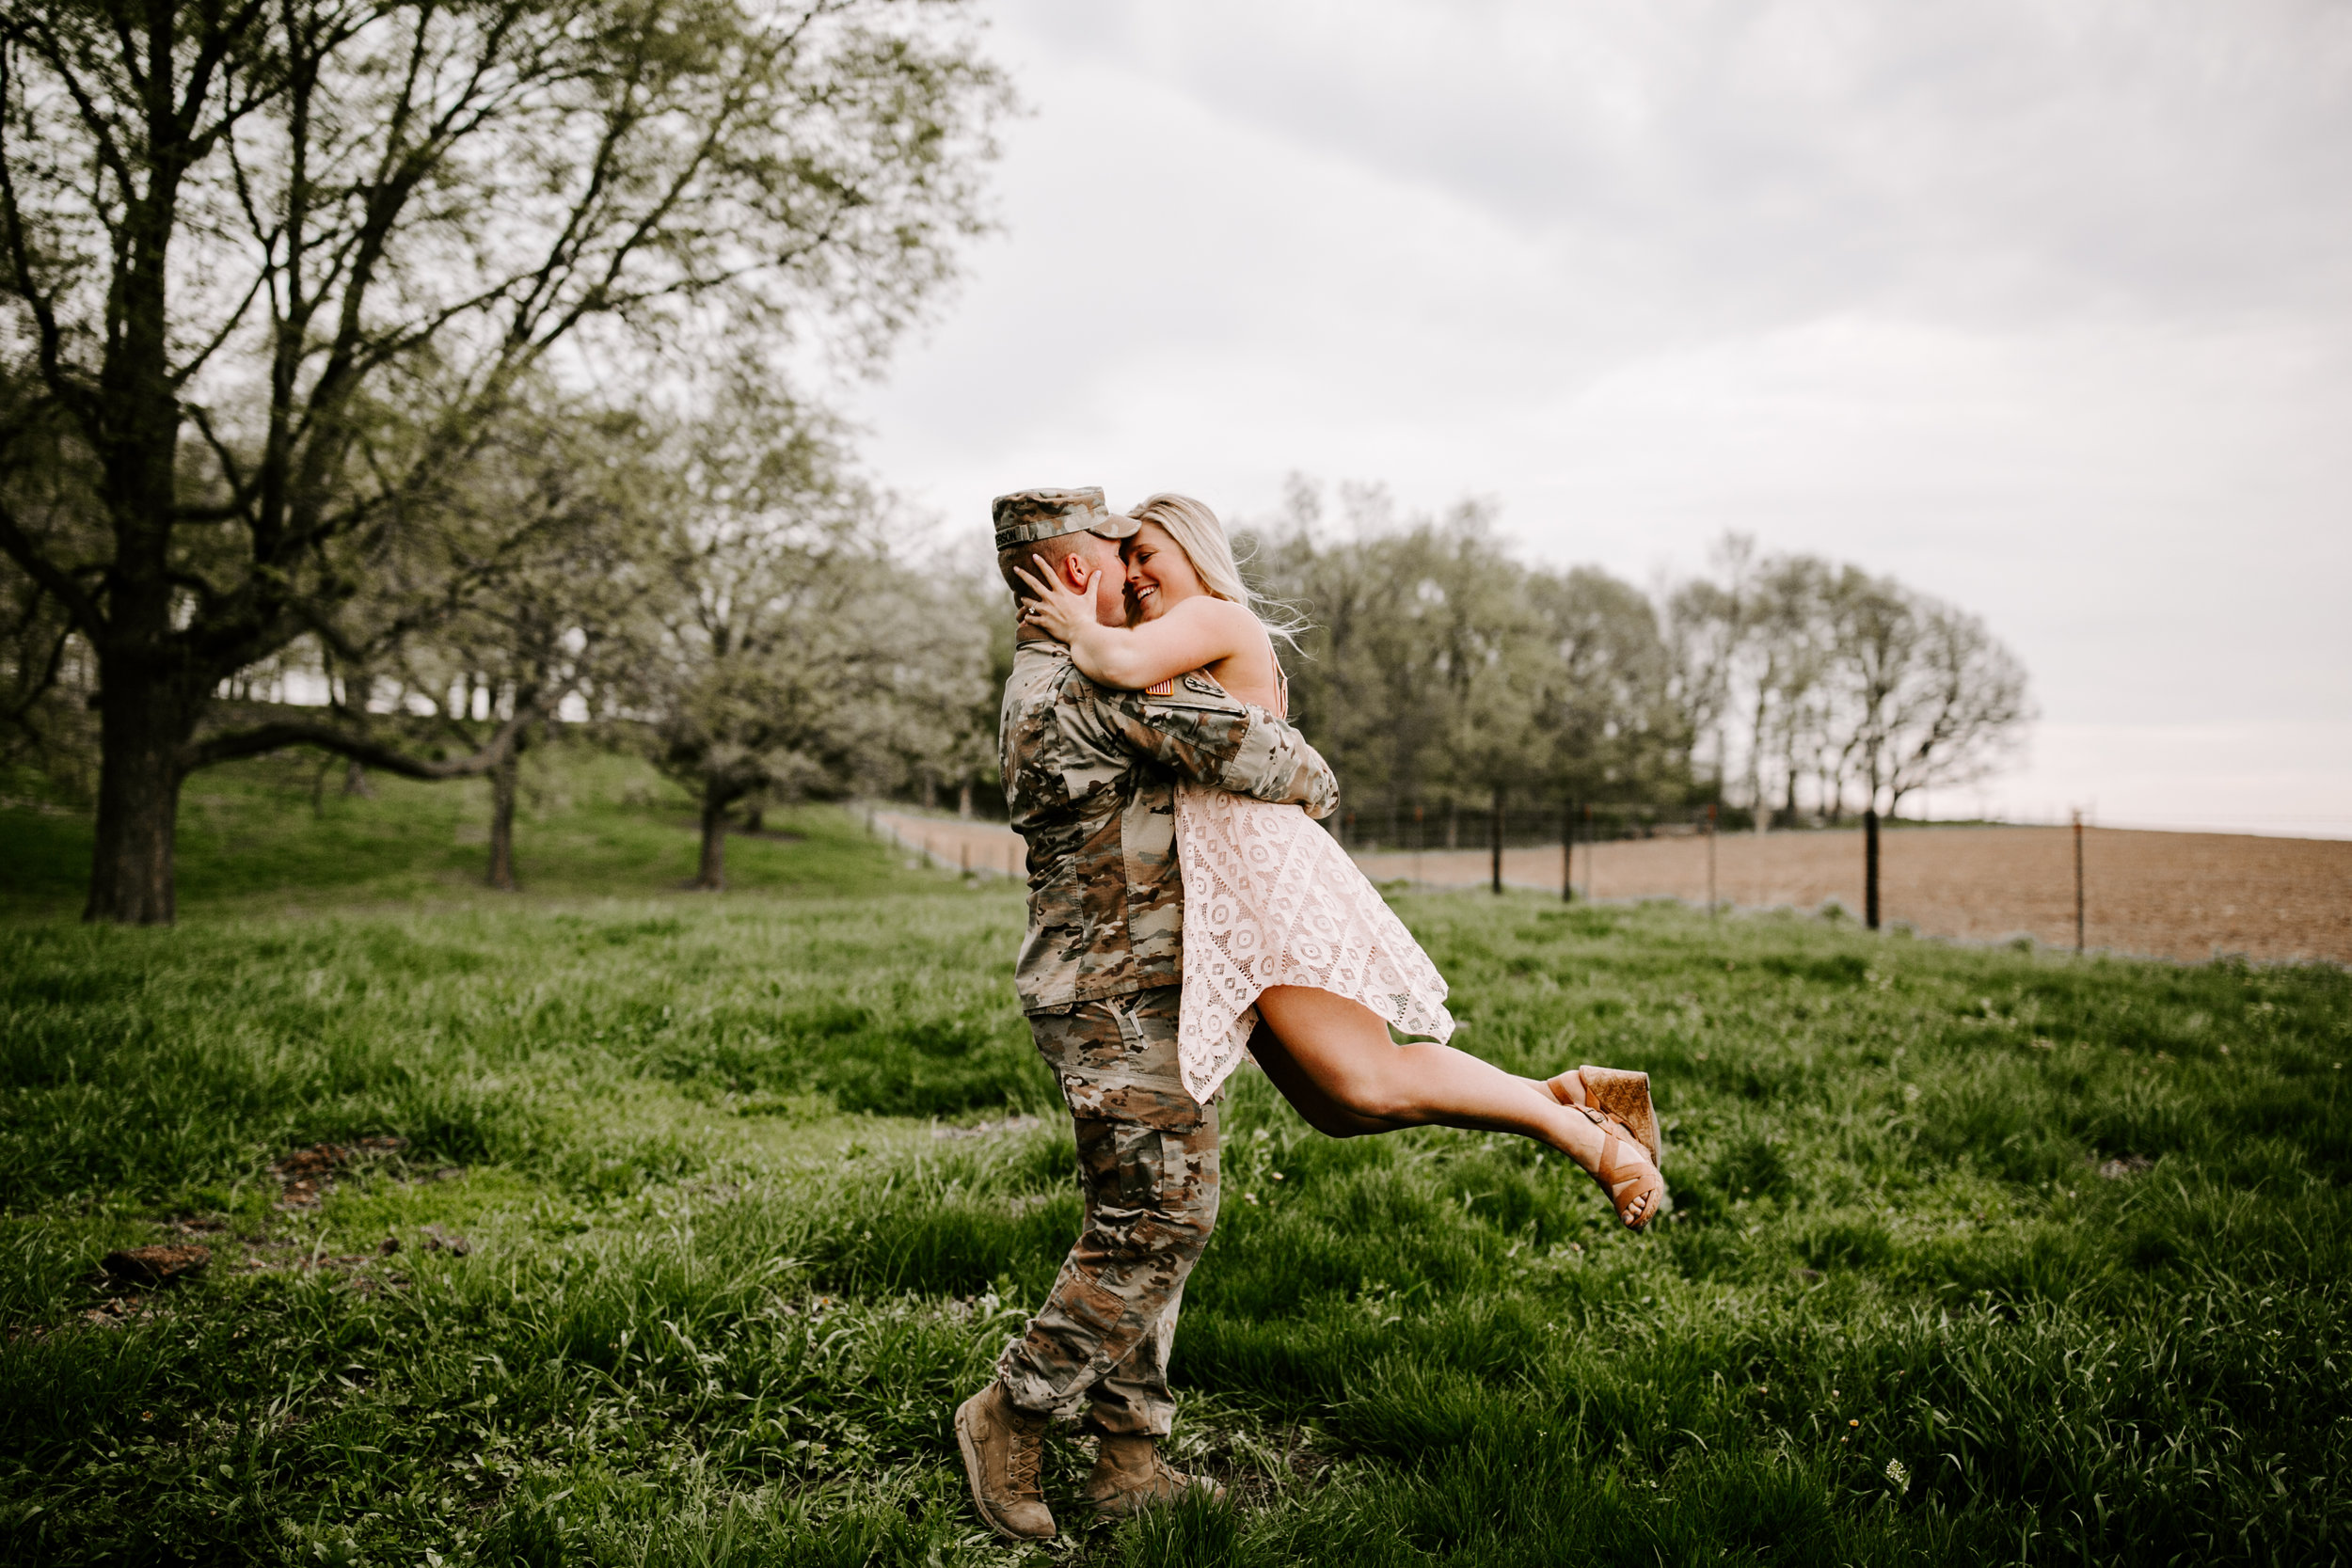 gracetphotography-wedding-photographer-adventure-bride-engagement-29.jpg